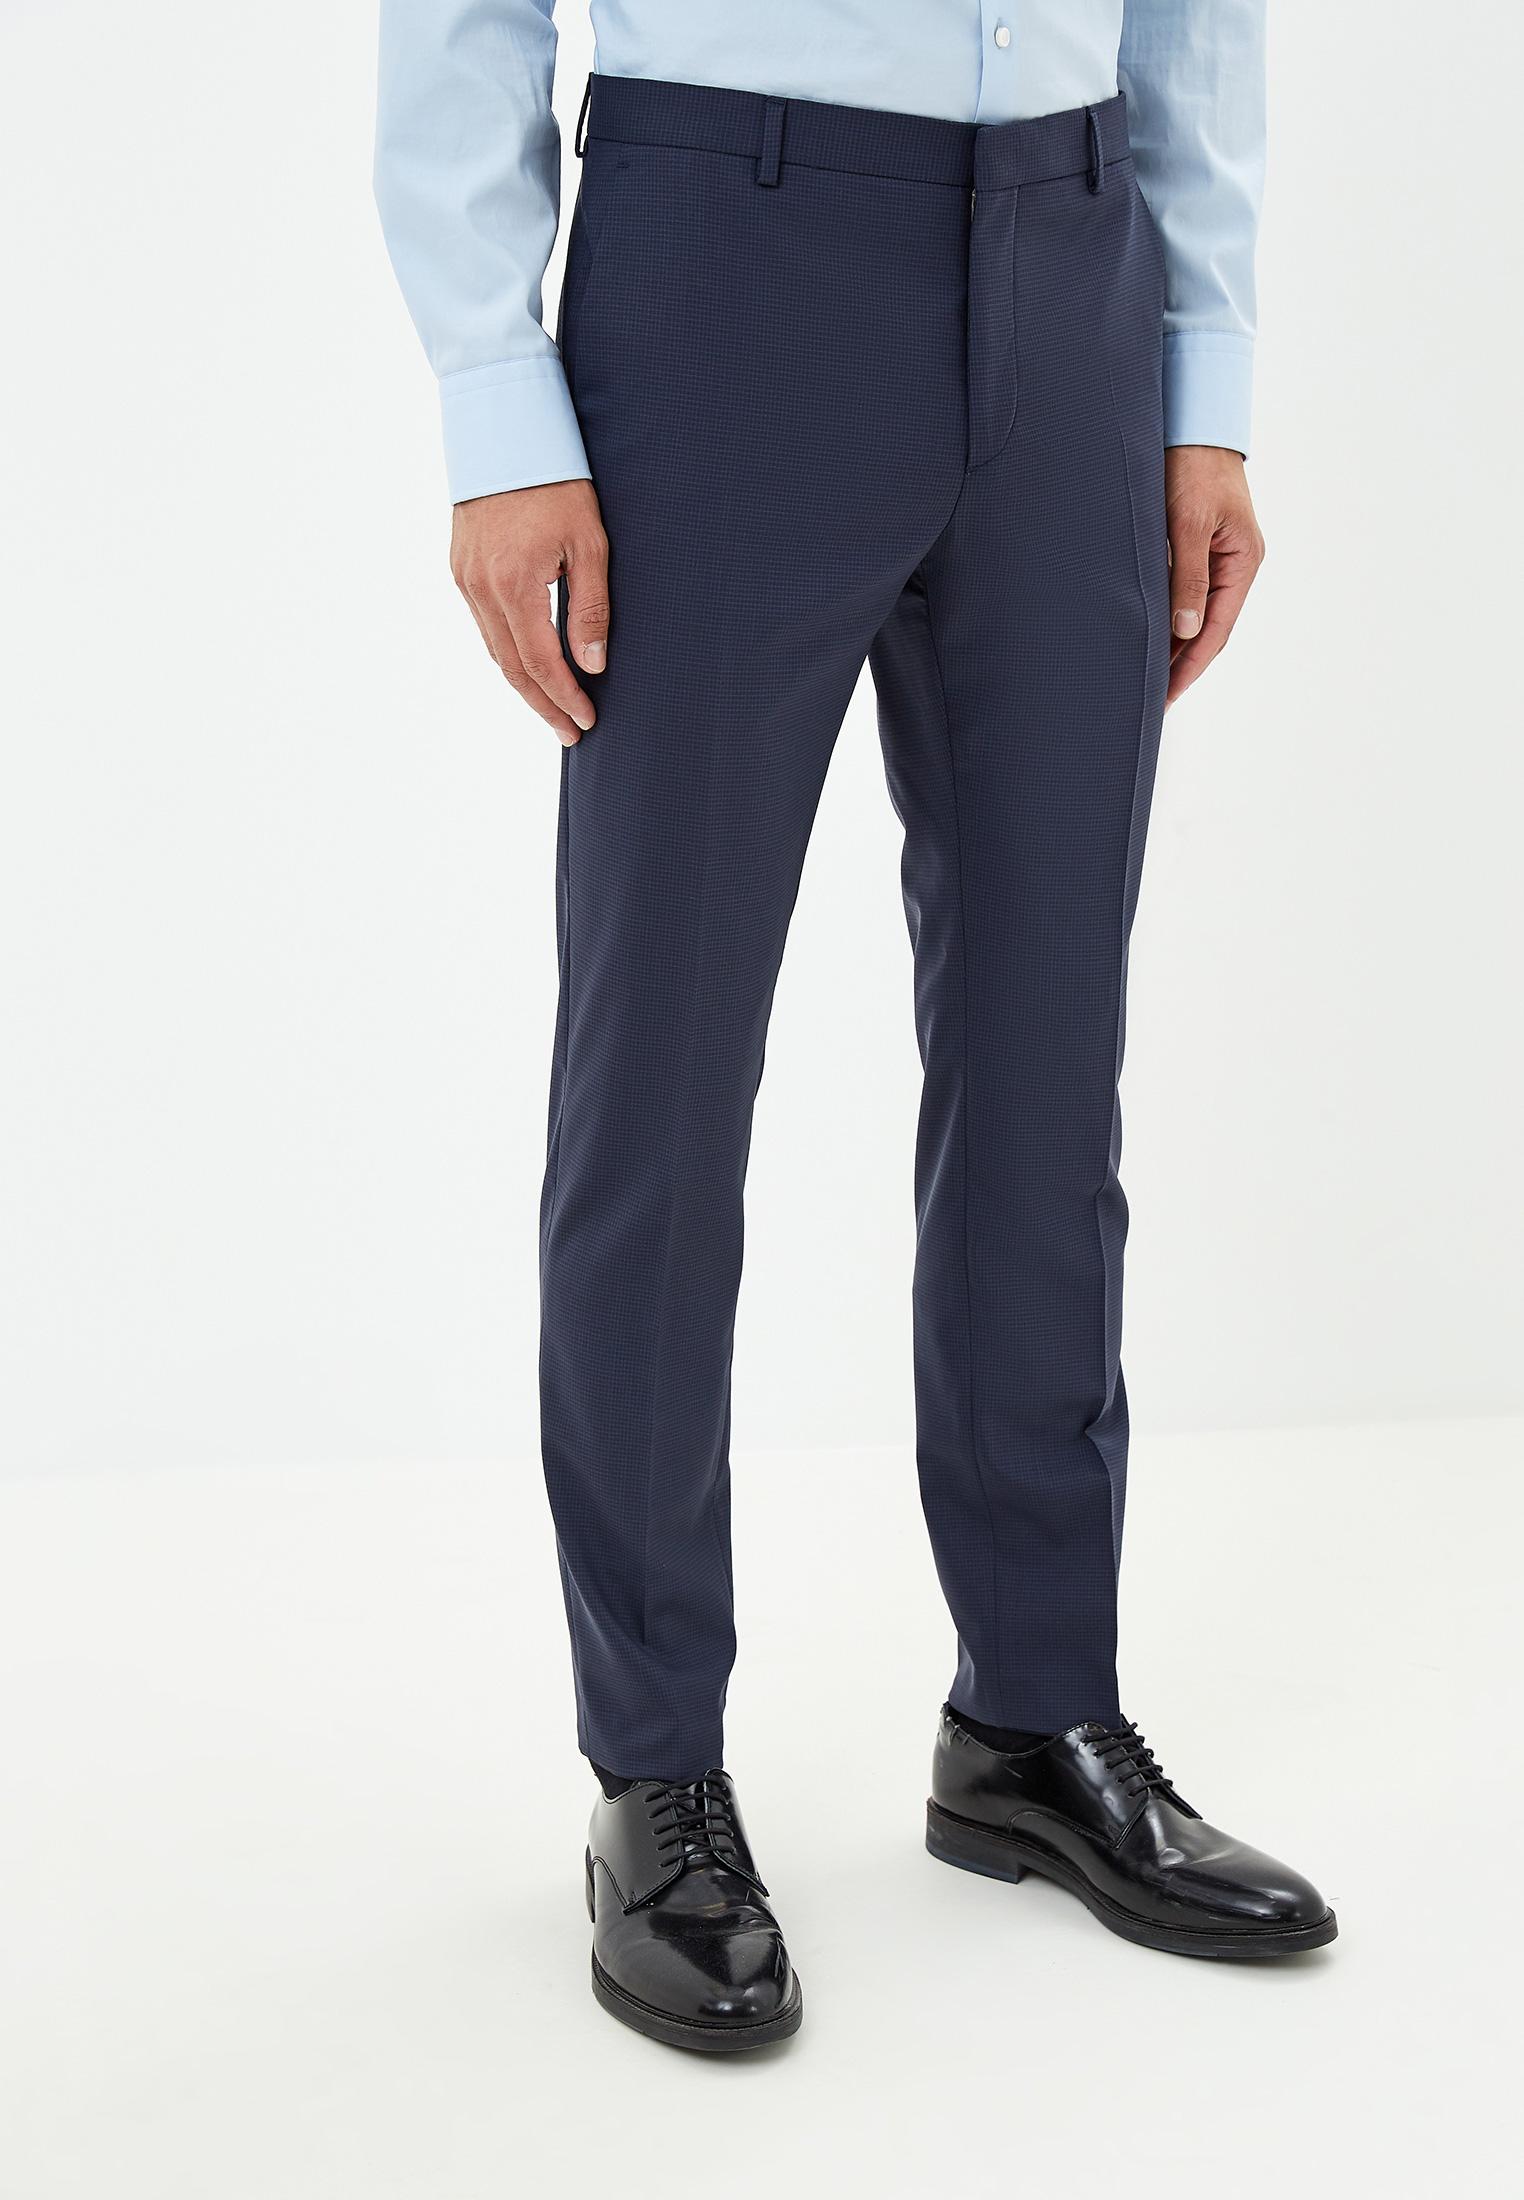 Мужские классические брюки Calvin Klein (Кельвин Кляйн) k10k103881